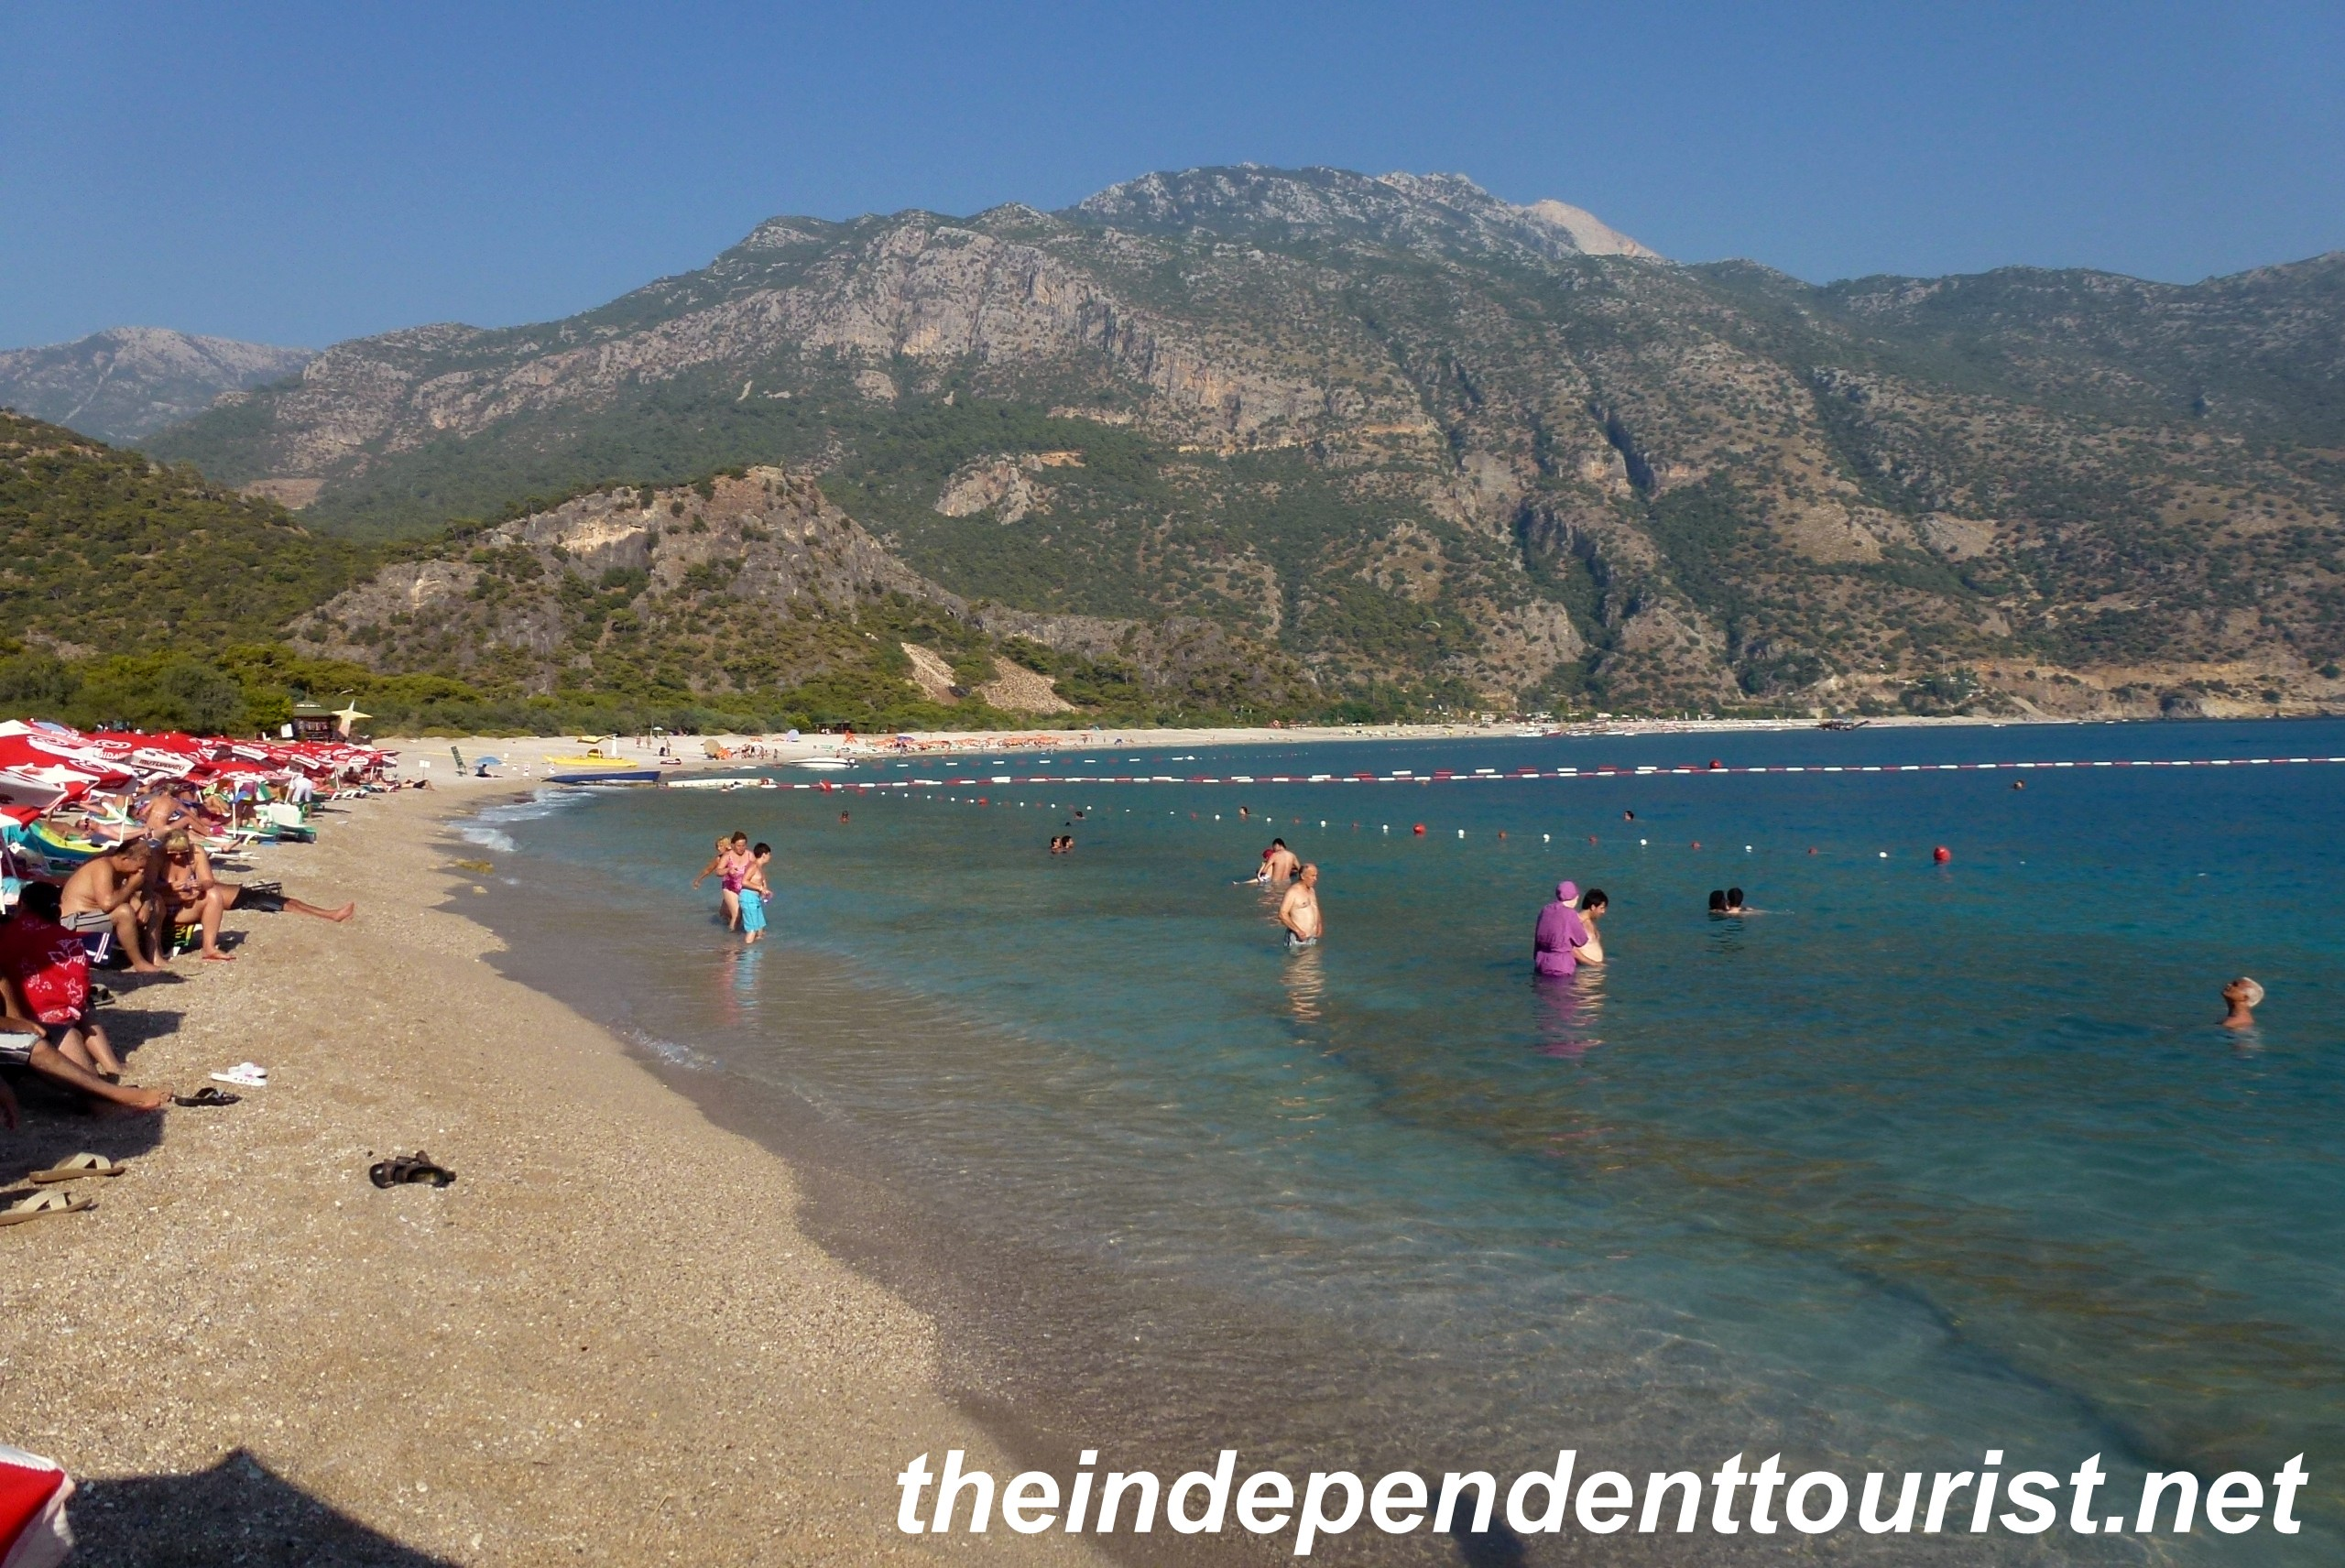 214 L 252 Deniz Beach One Of Turkey S Best And Everyone Knows